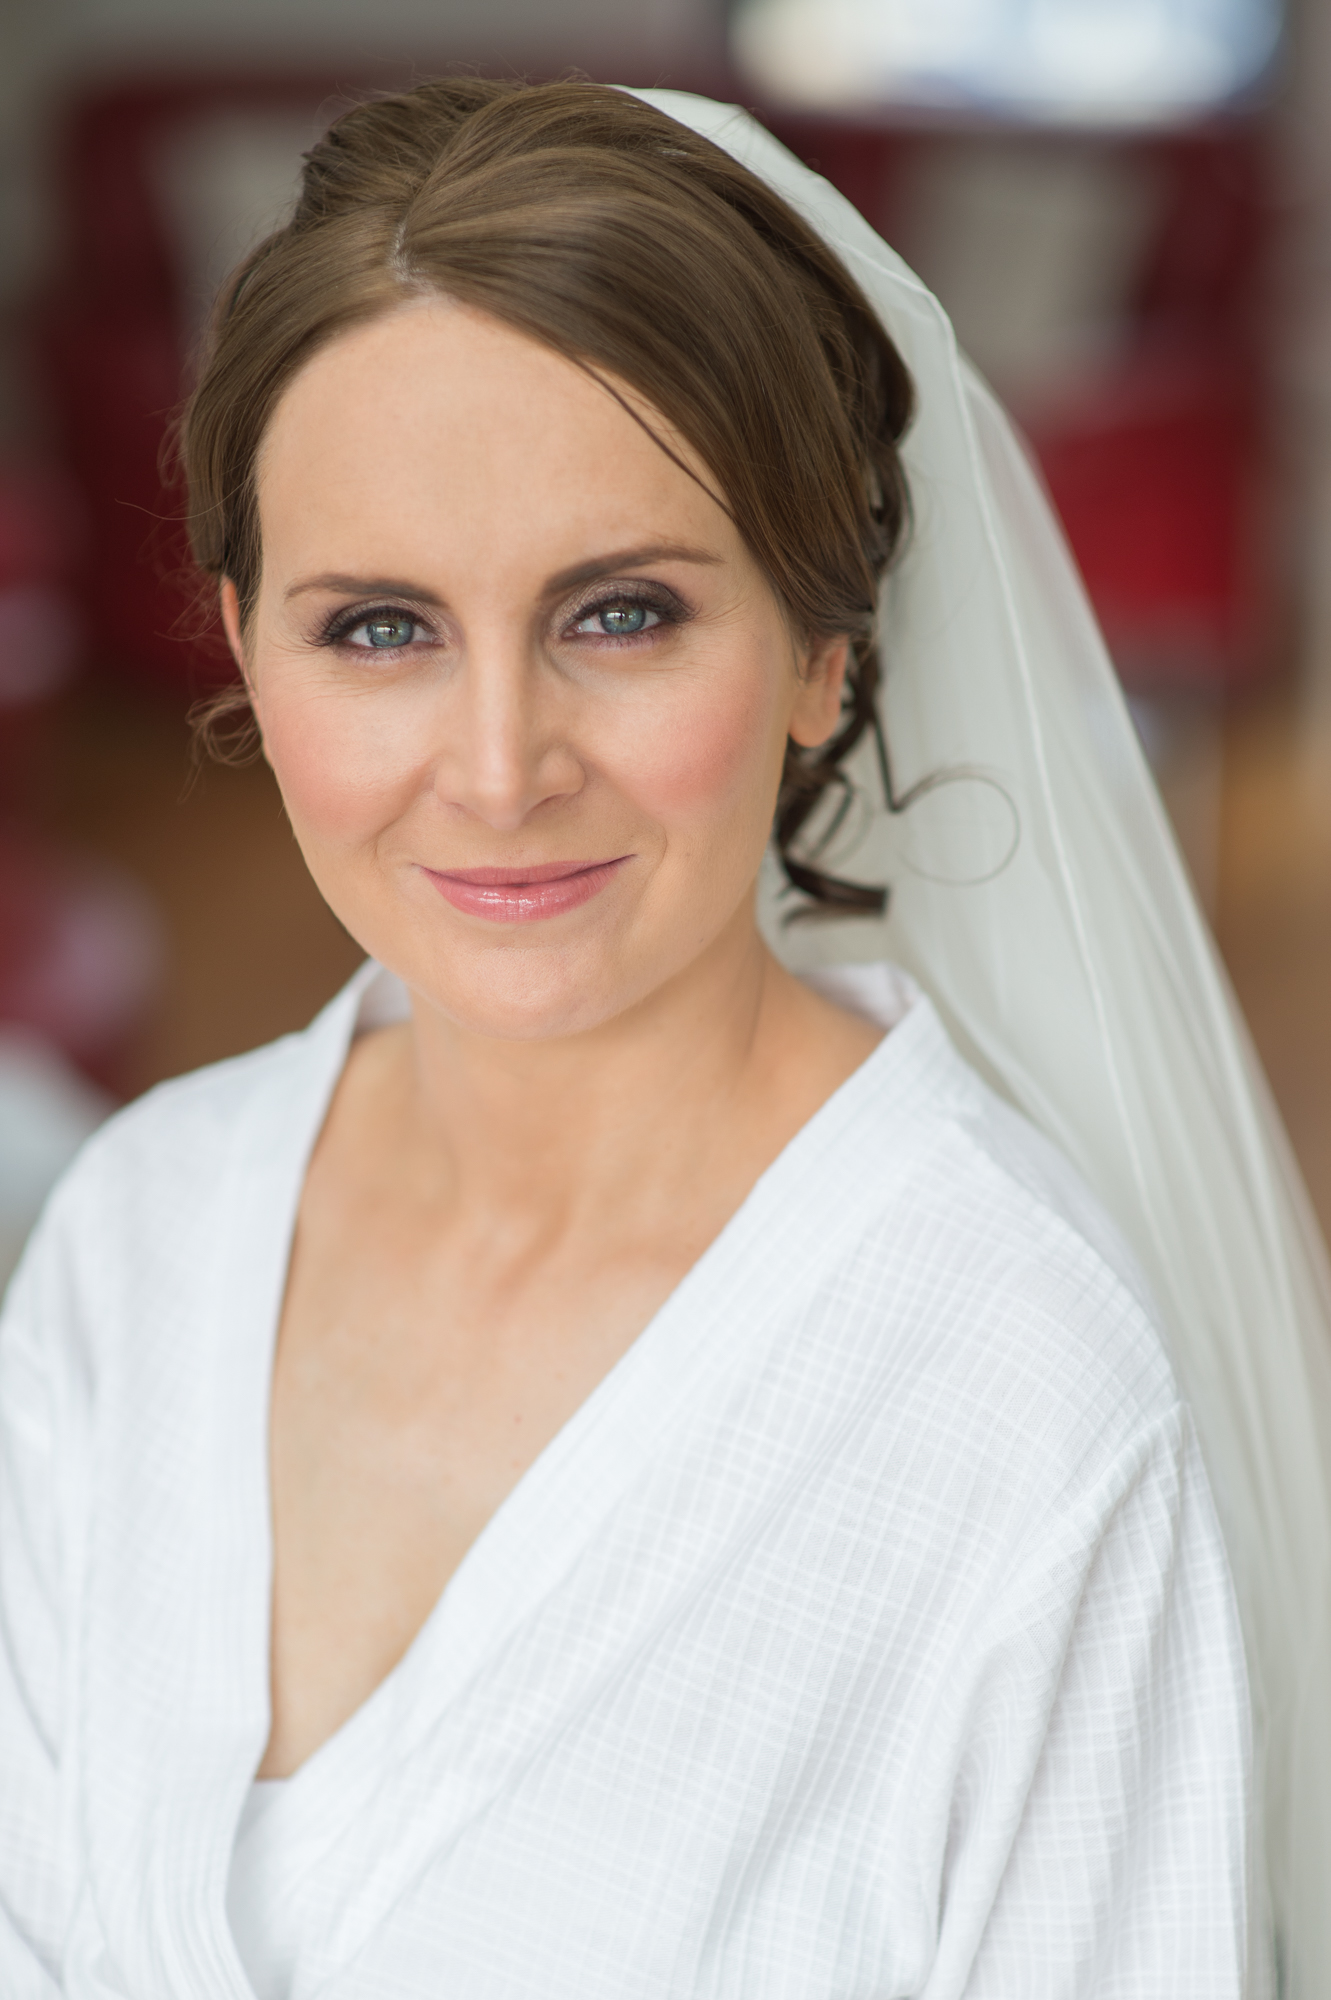 Michael_Gill_Photography_Wedding_Greencastle_Lousie_Jason_Donegal-1.jpg